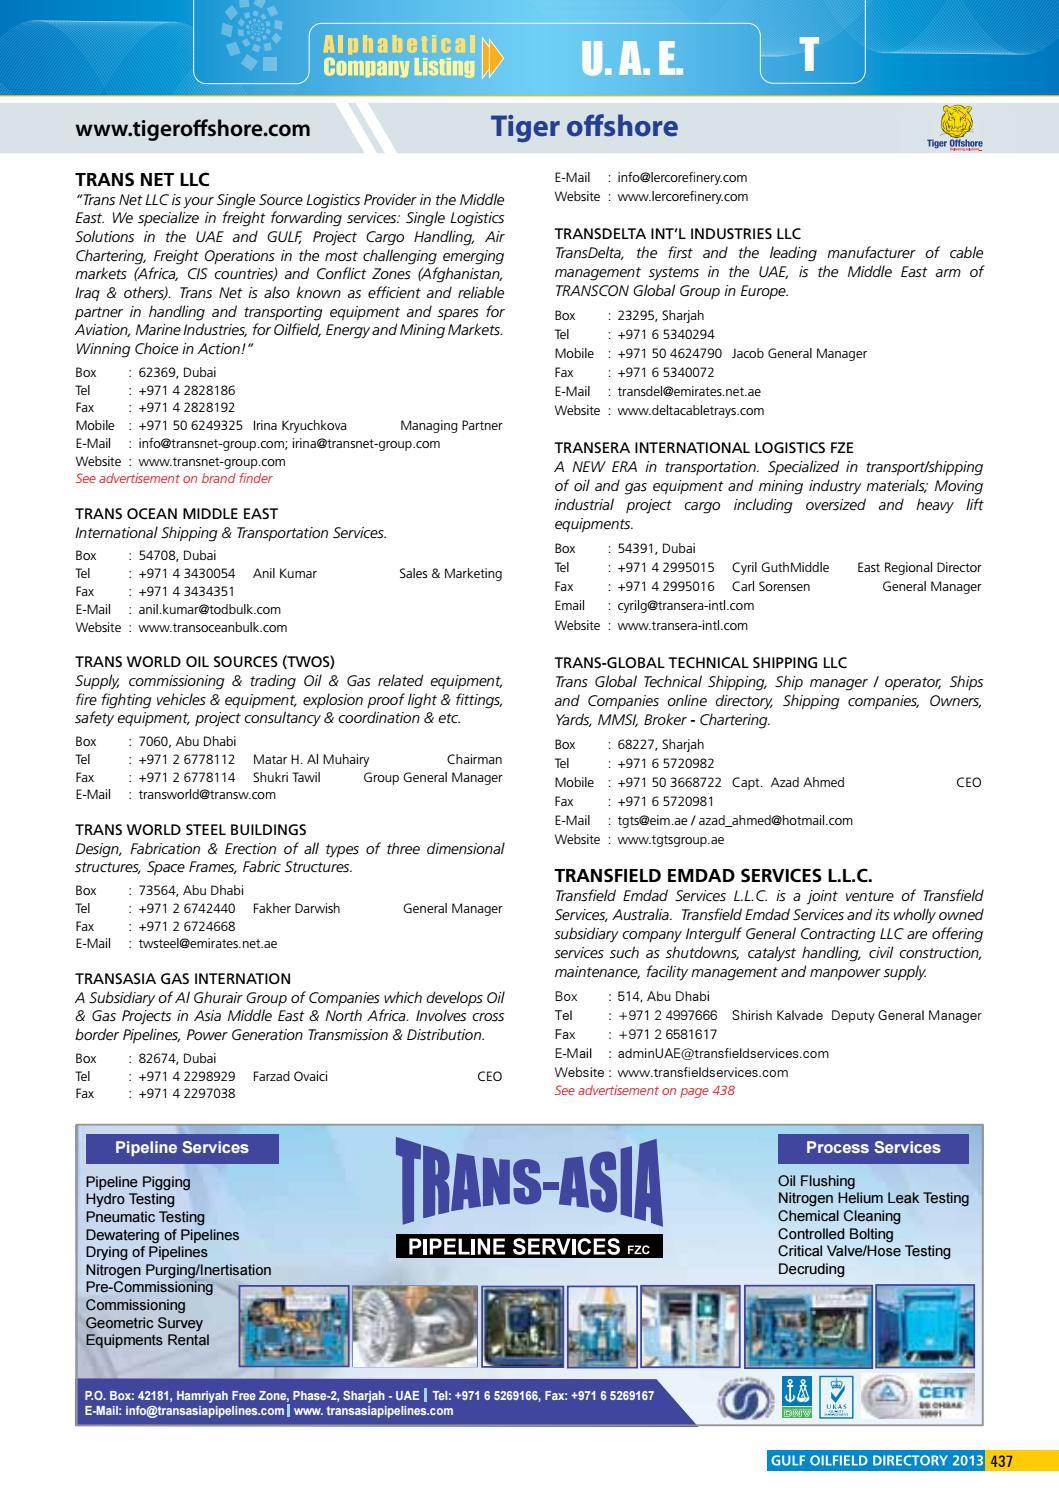 Gulf Oilfield Directory 2013 Edition